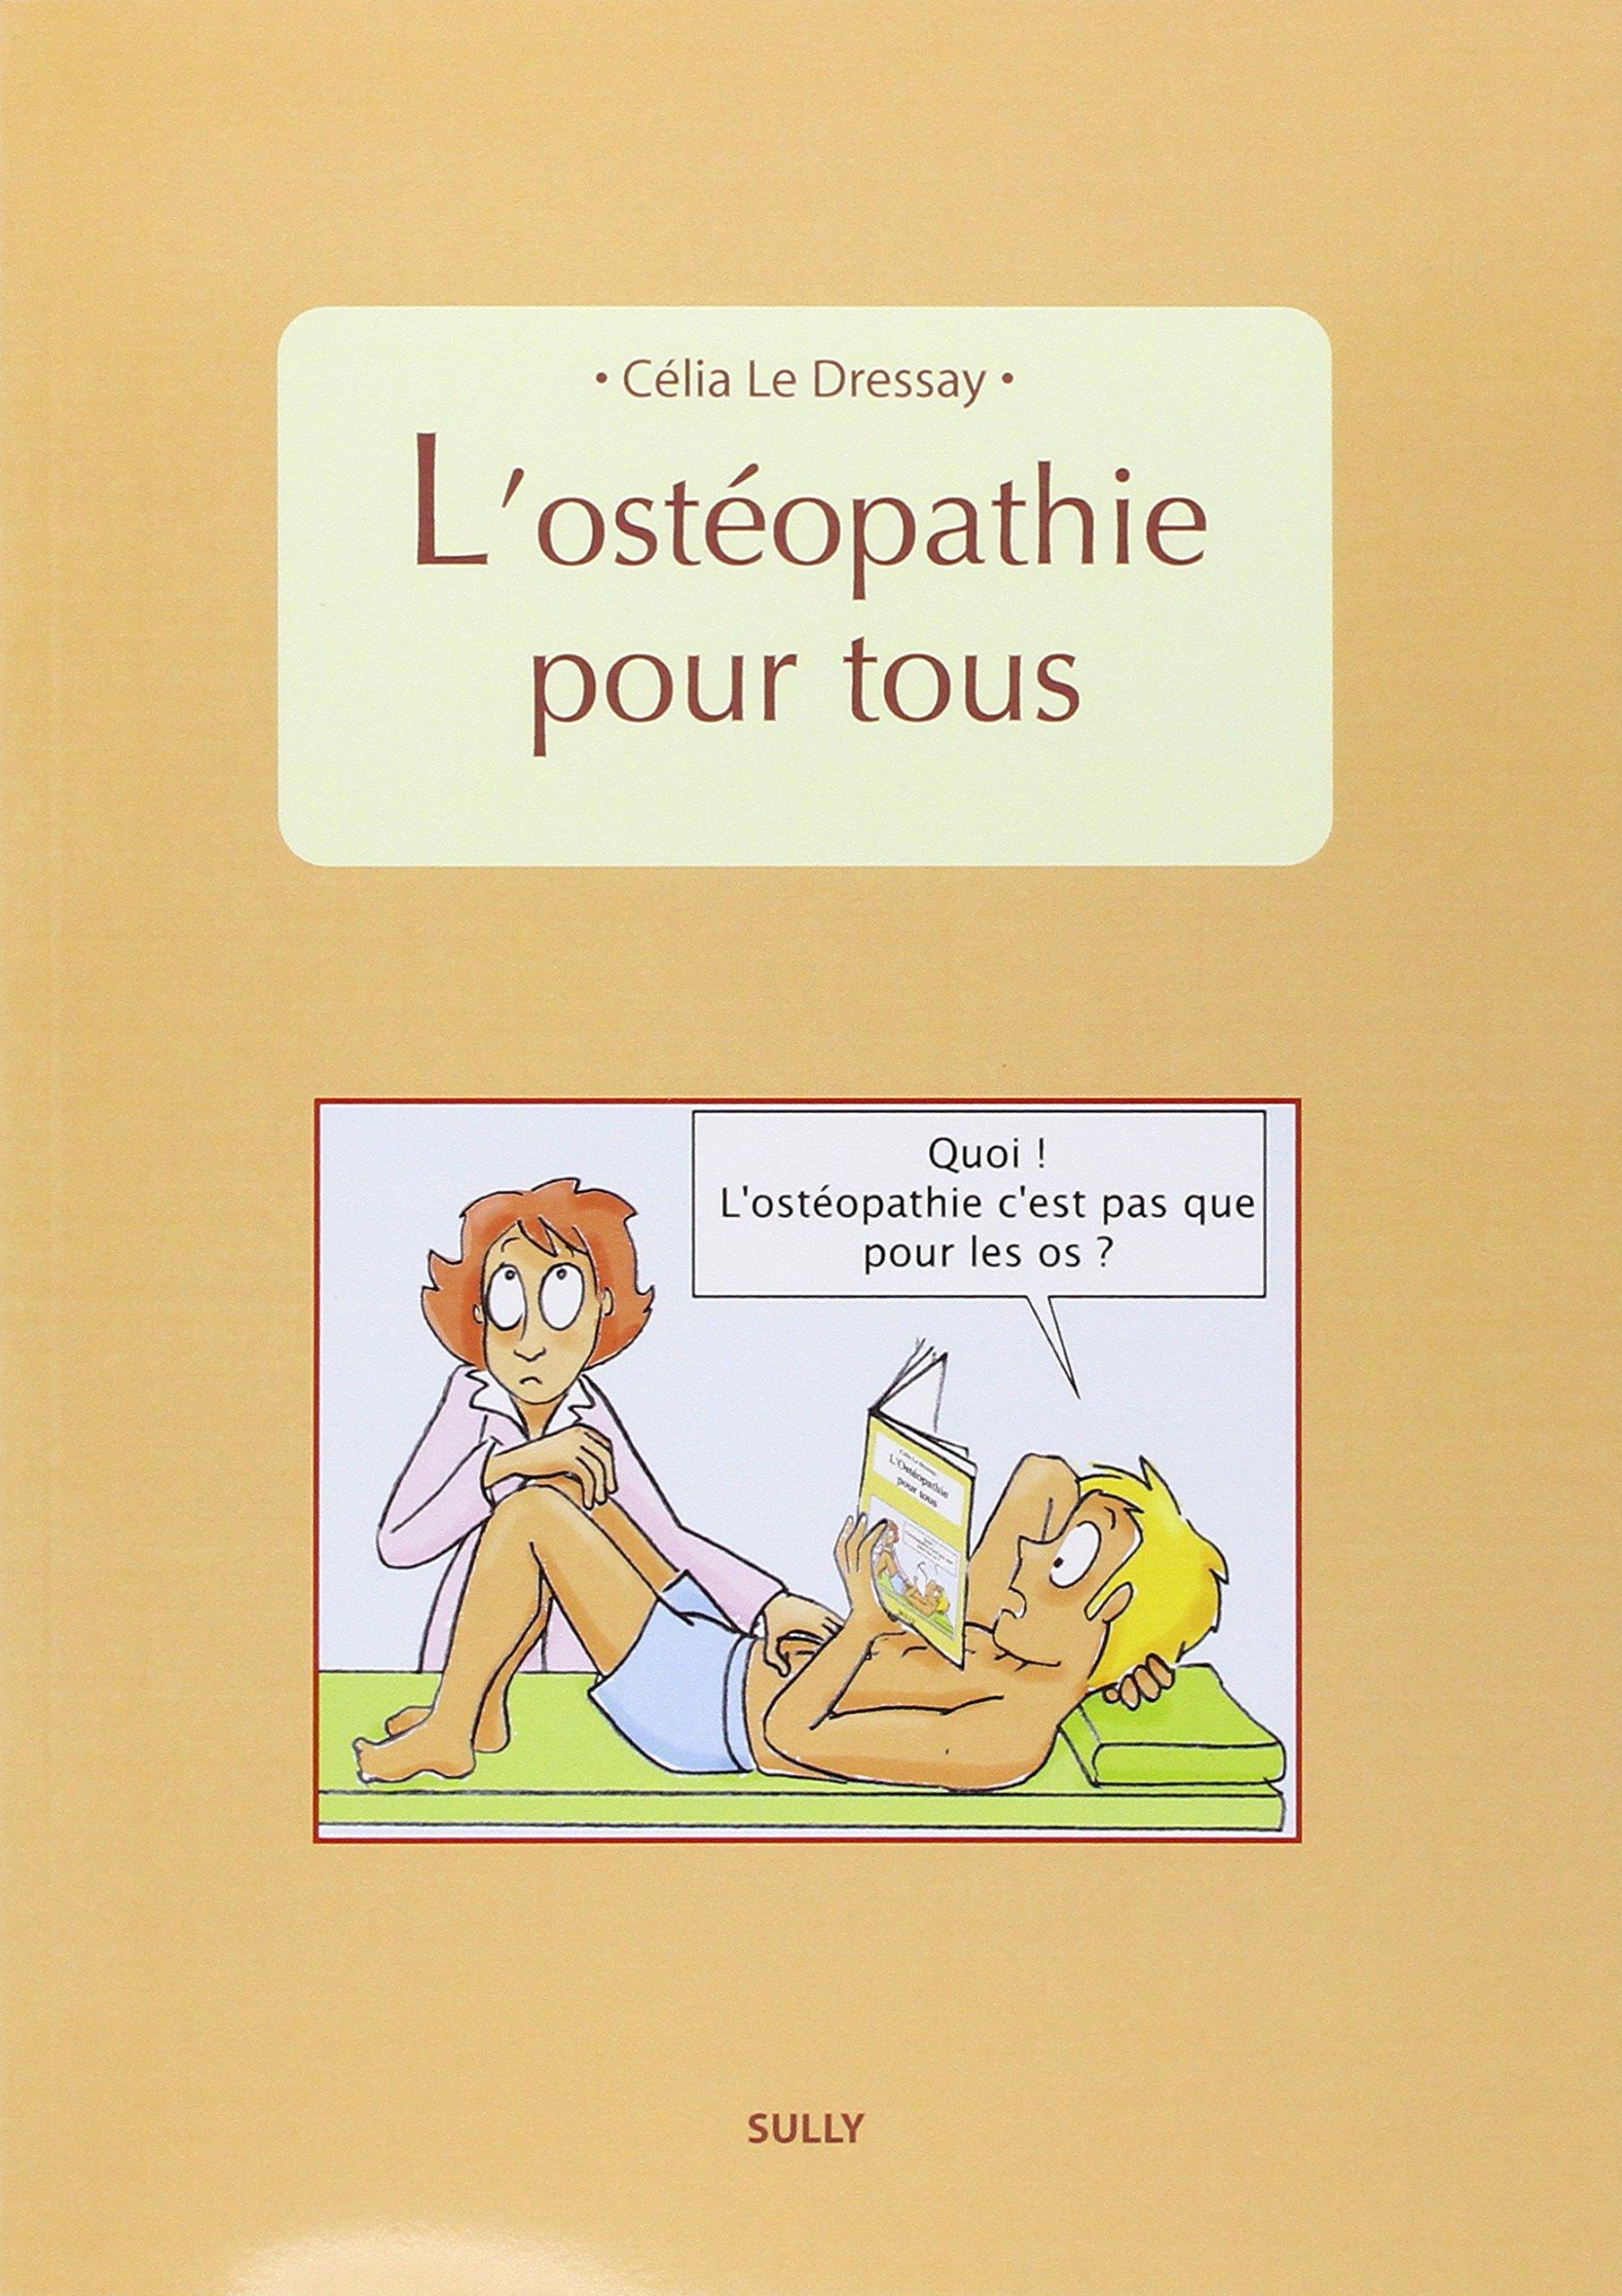 image drole osteopathe